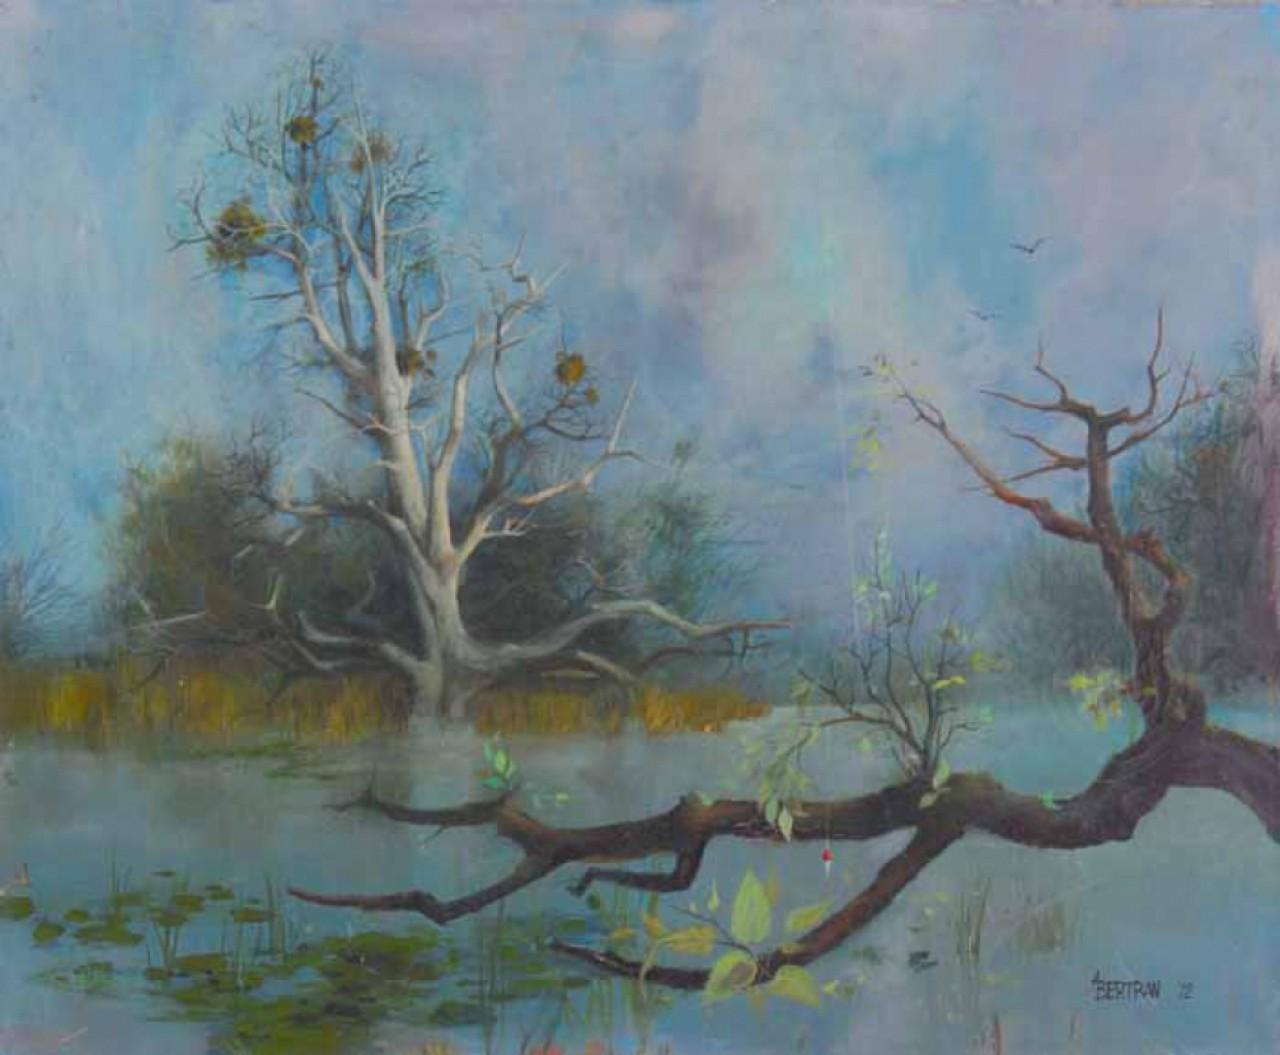 BERTRAN paysage d'un lac